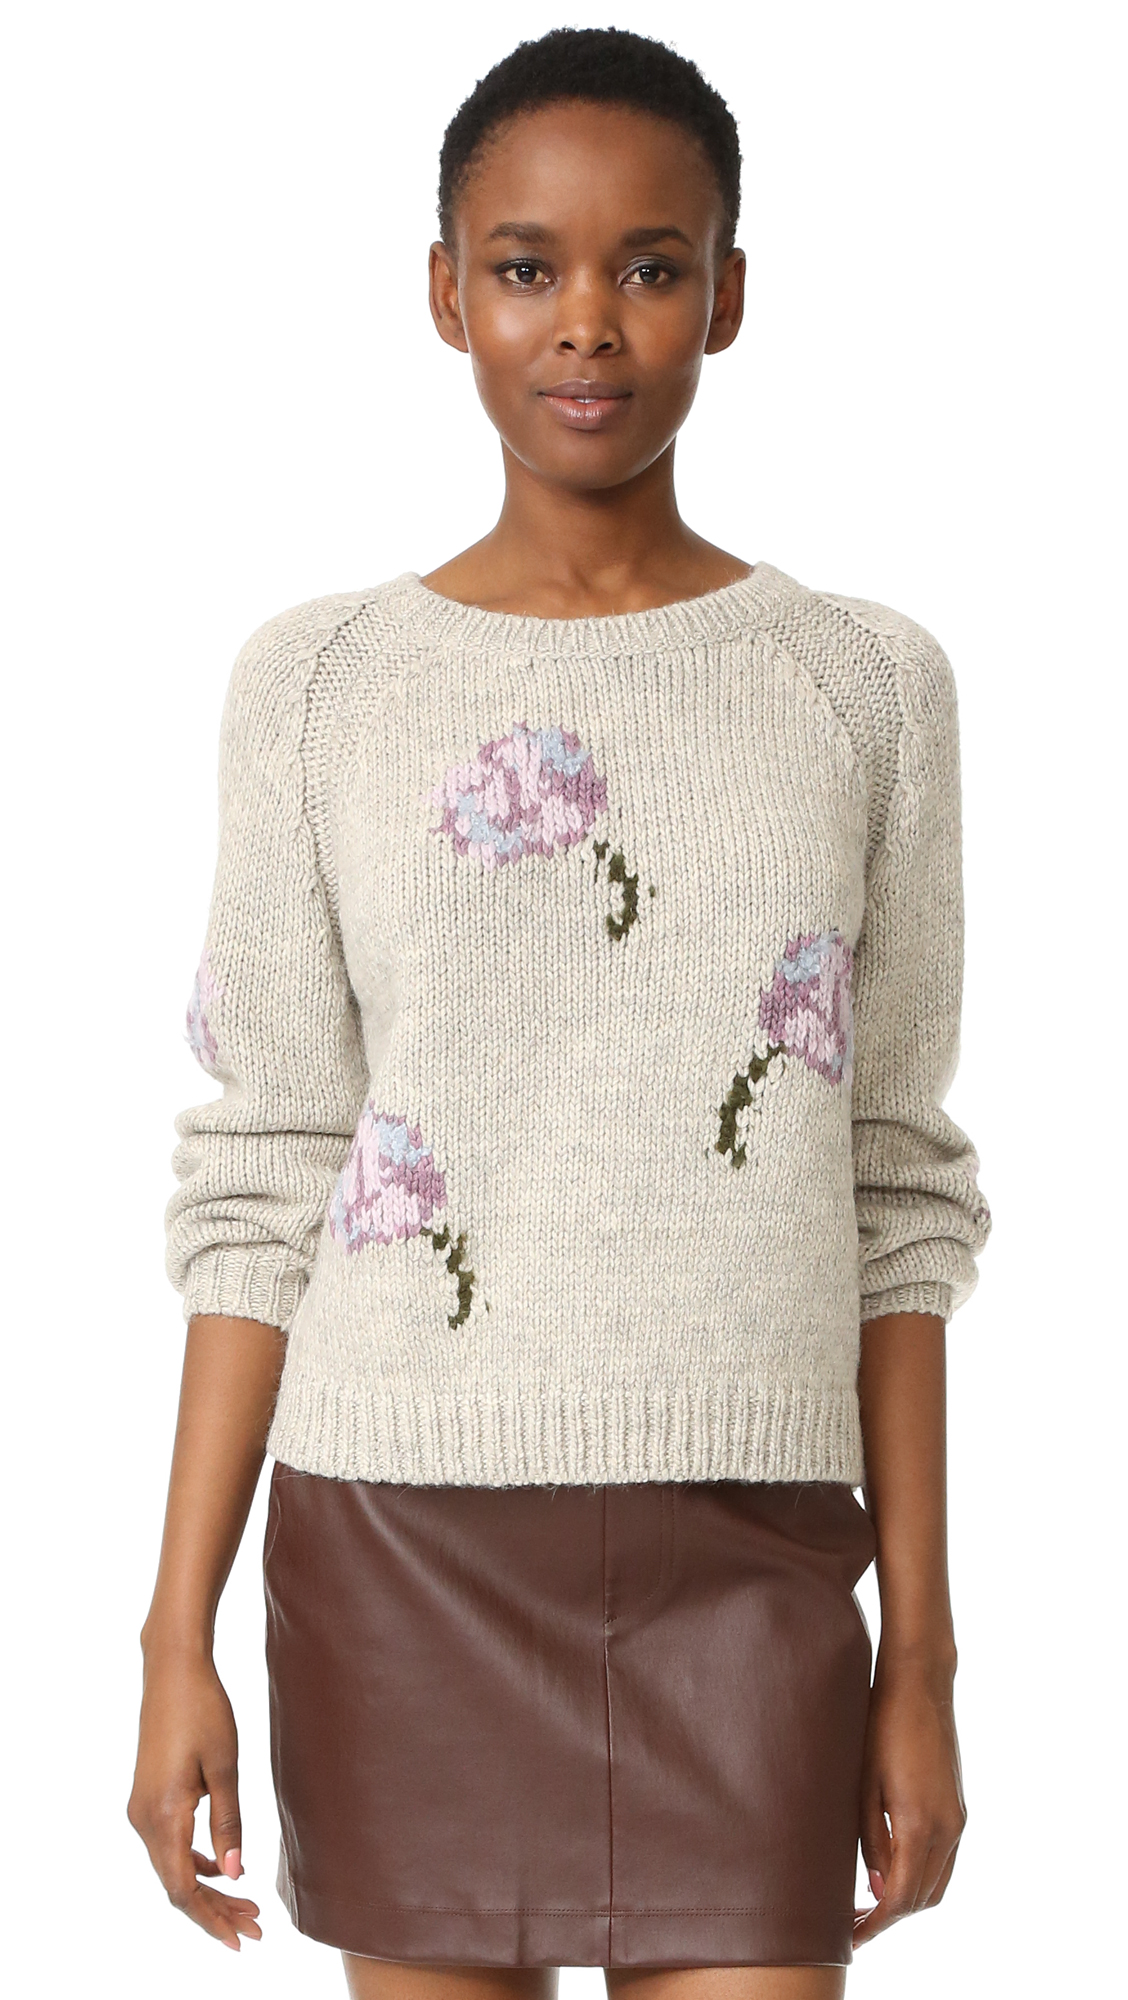 bbf3de125c7 La Vie Rebecca Taylor Floral Intarsia Pullover - Light Grey Melange